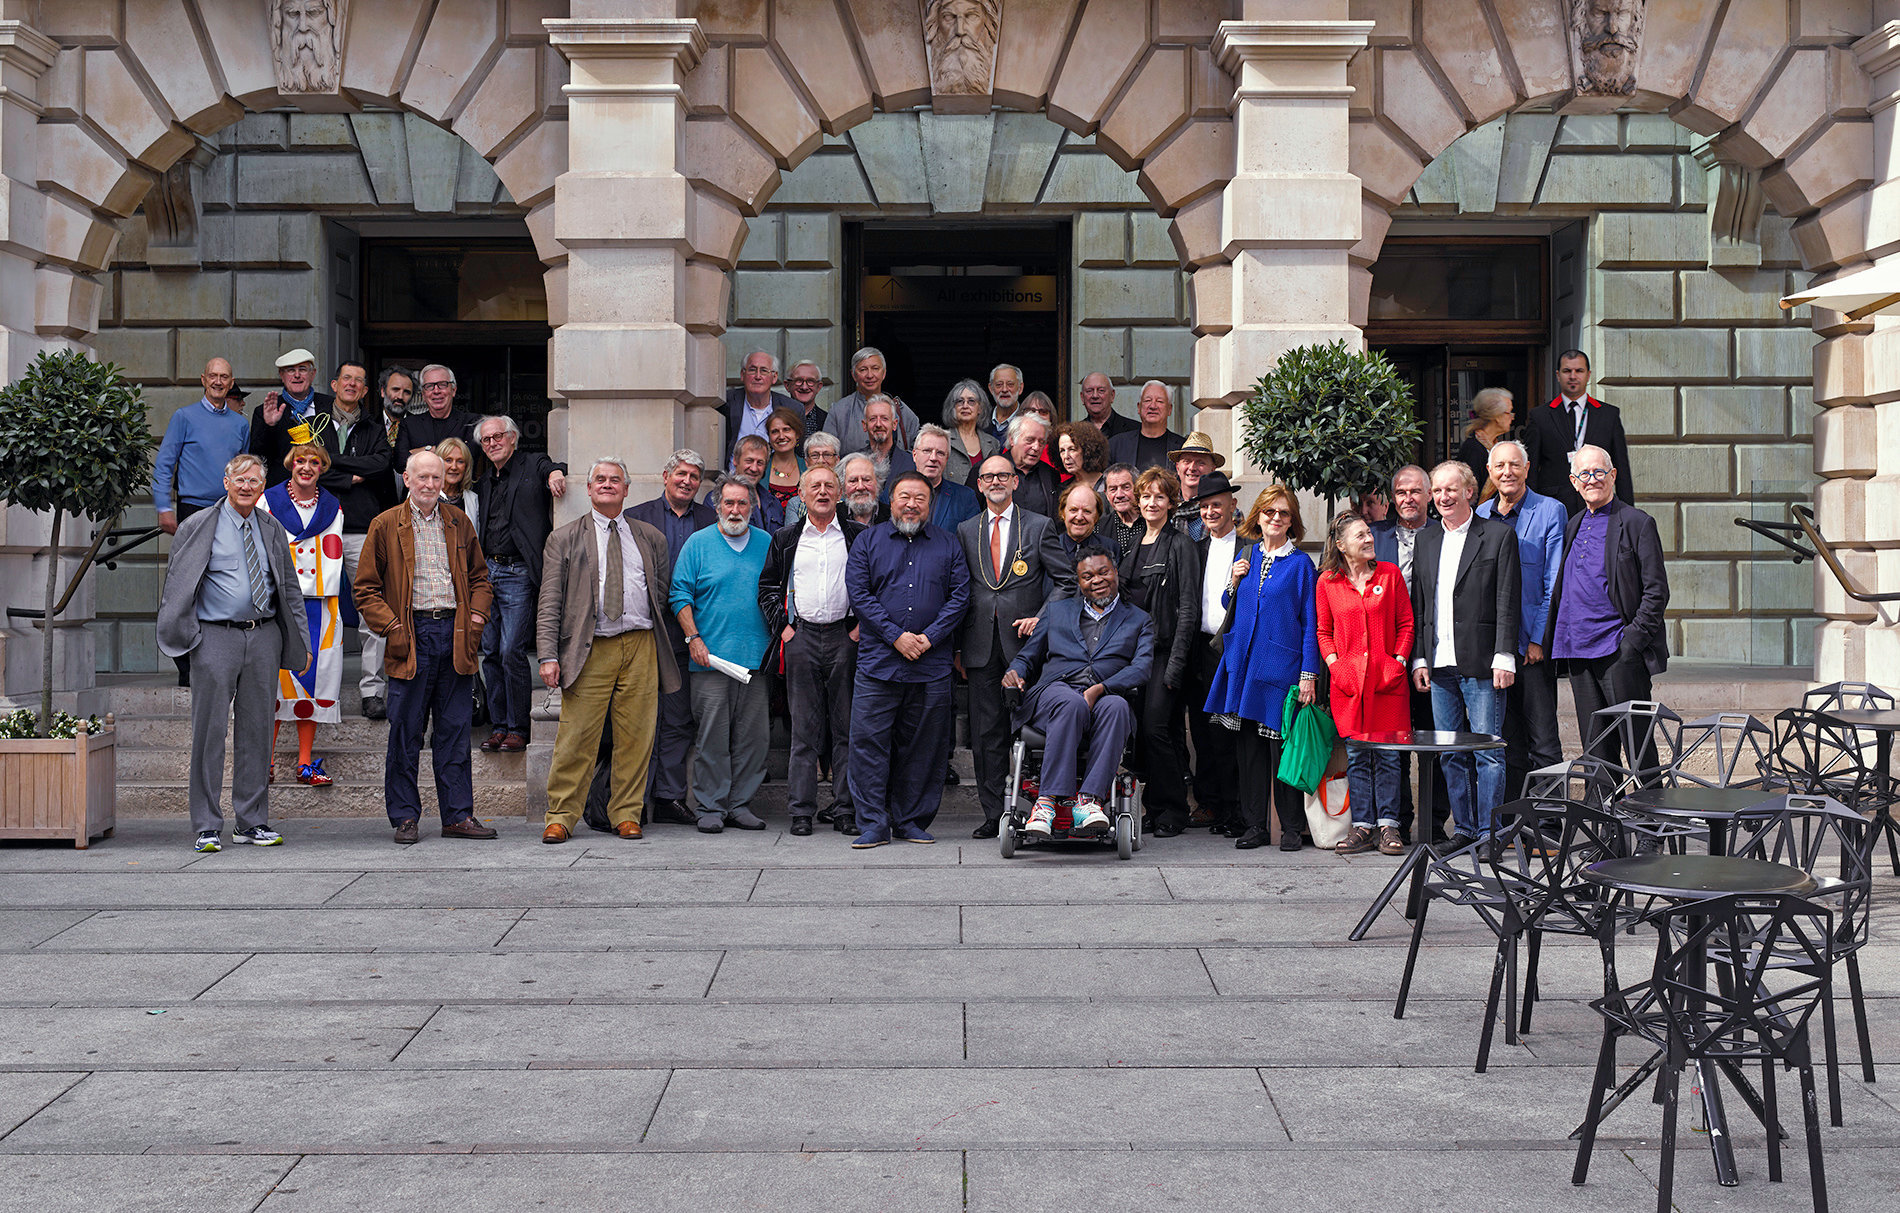 Royal Academicians September 2015